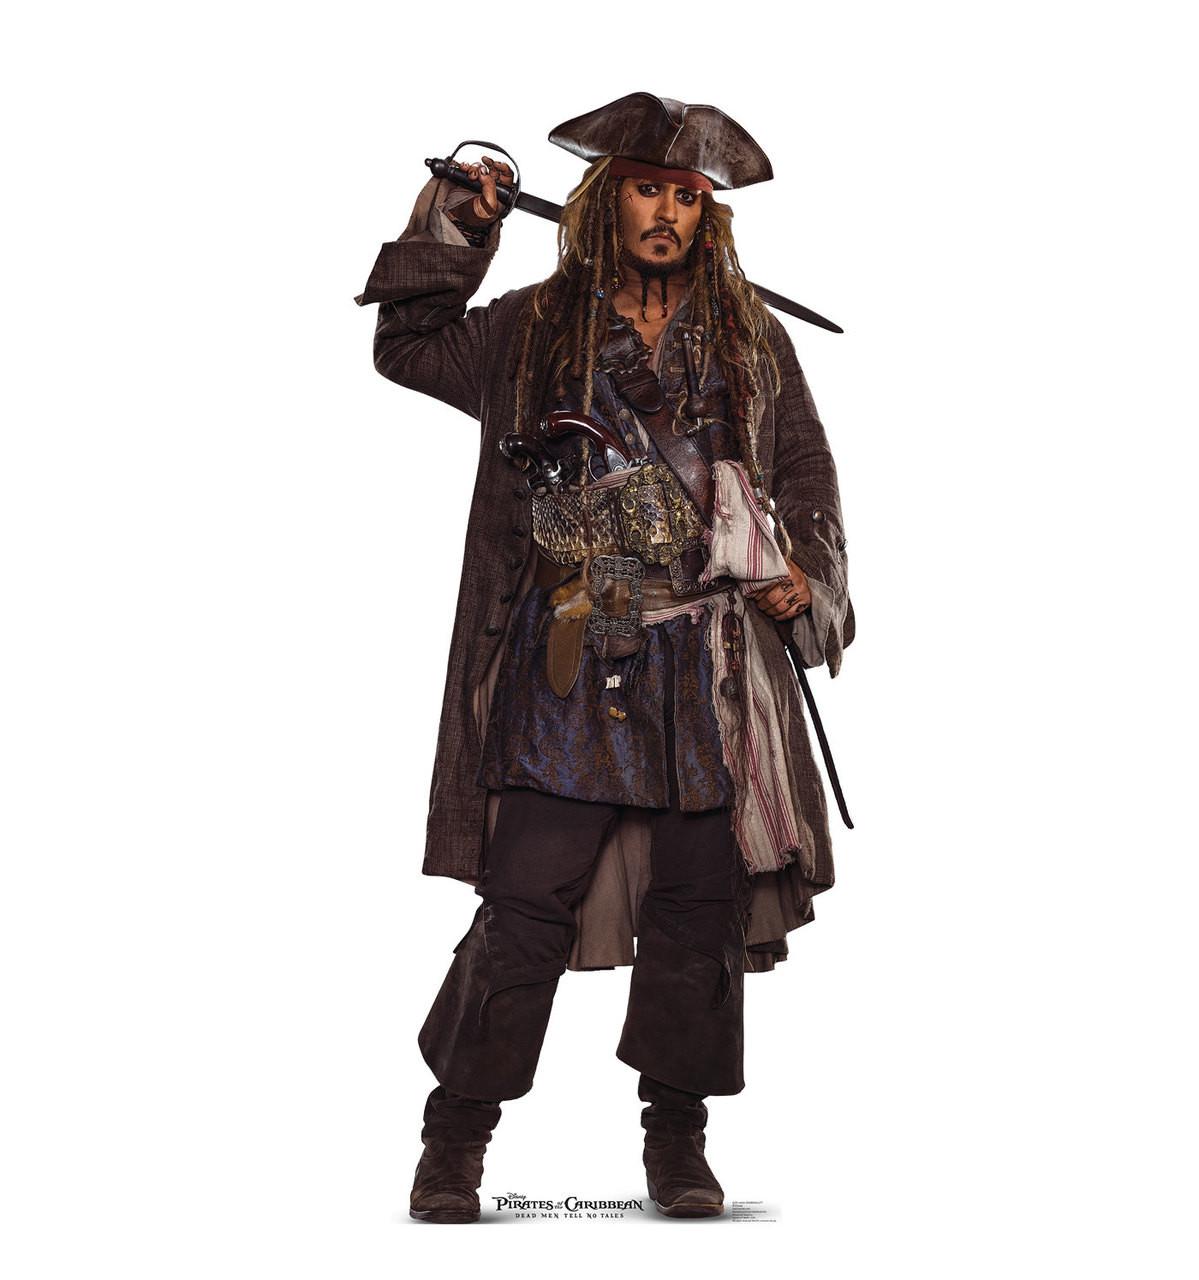 Jack Sparrow 02 - POTC 5 - Cardboard Cutout 2279